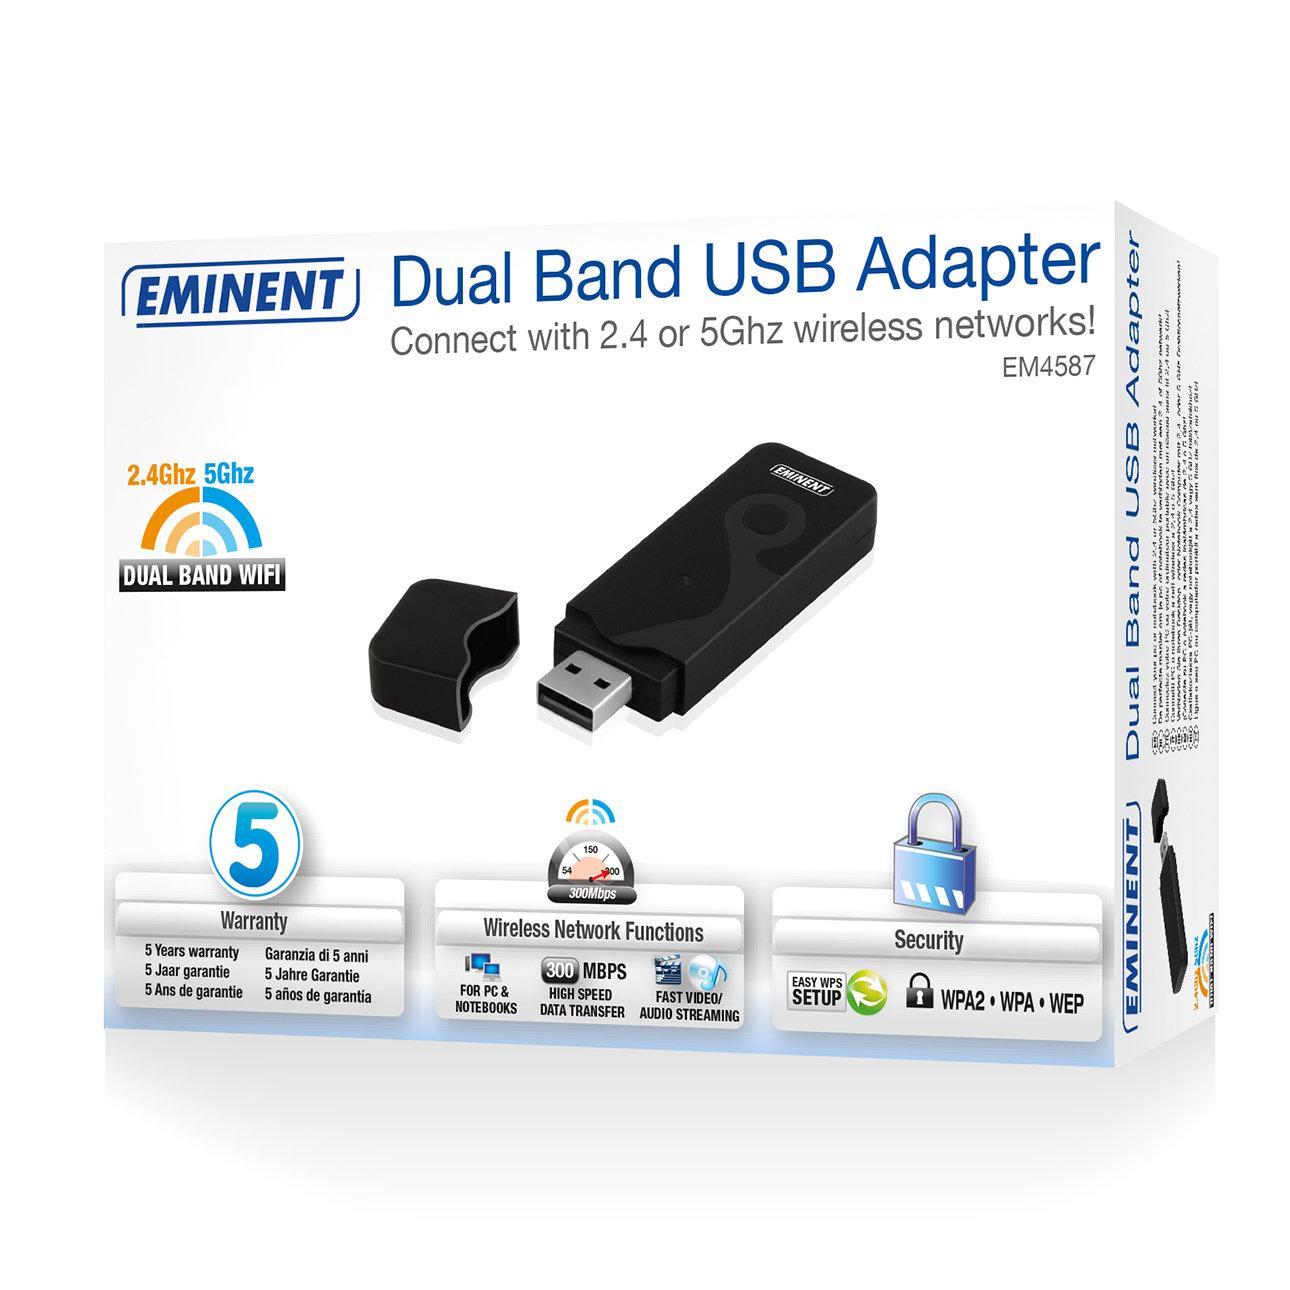 Eminent EM4587 Dual Band WiFi 300N USB adapter